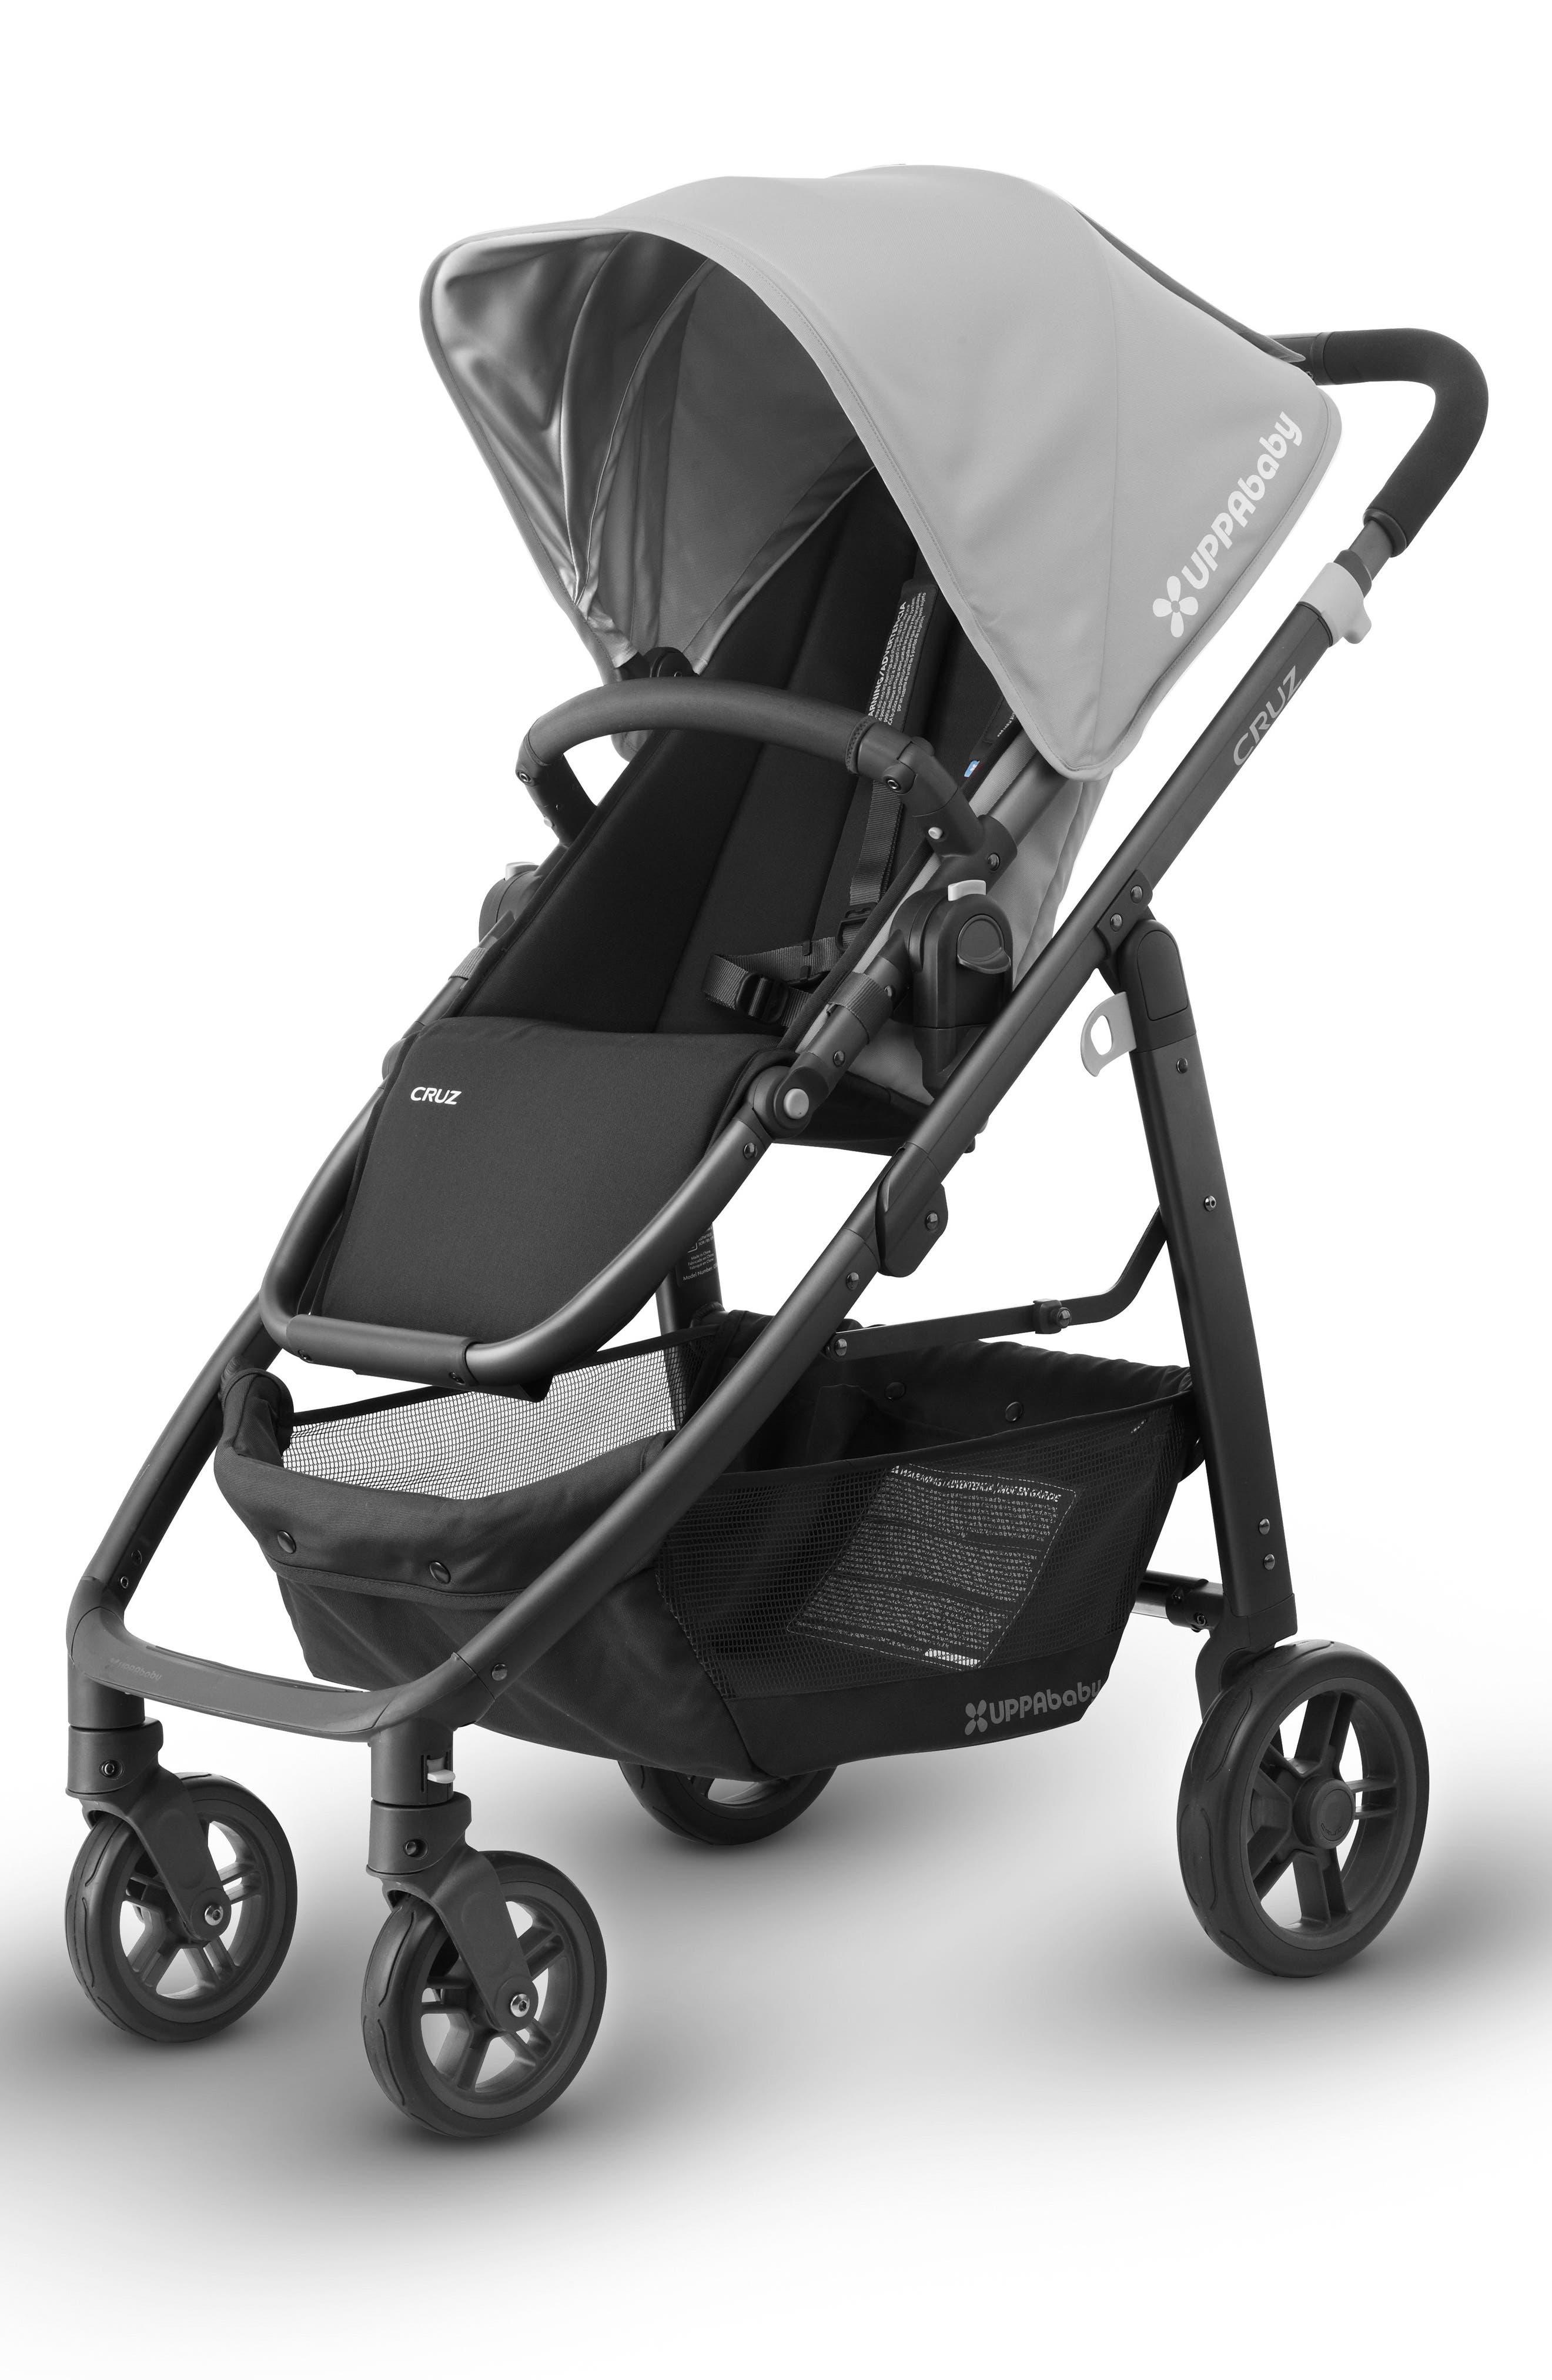 Main Image - UPPAbaby 2017 CRUZ Aluminum Frame Stroller